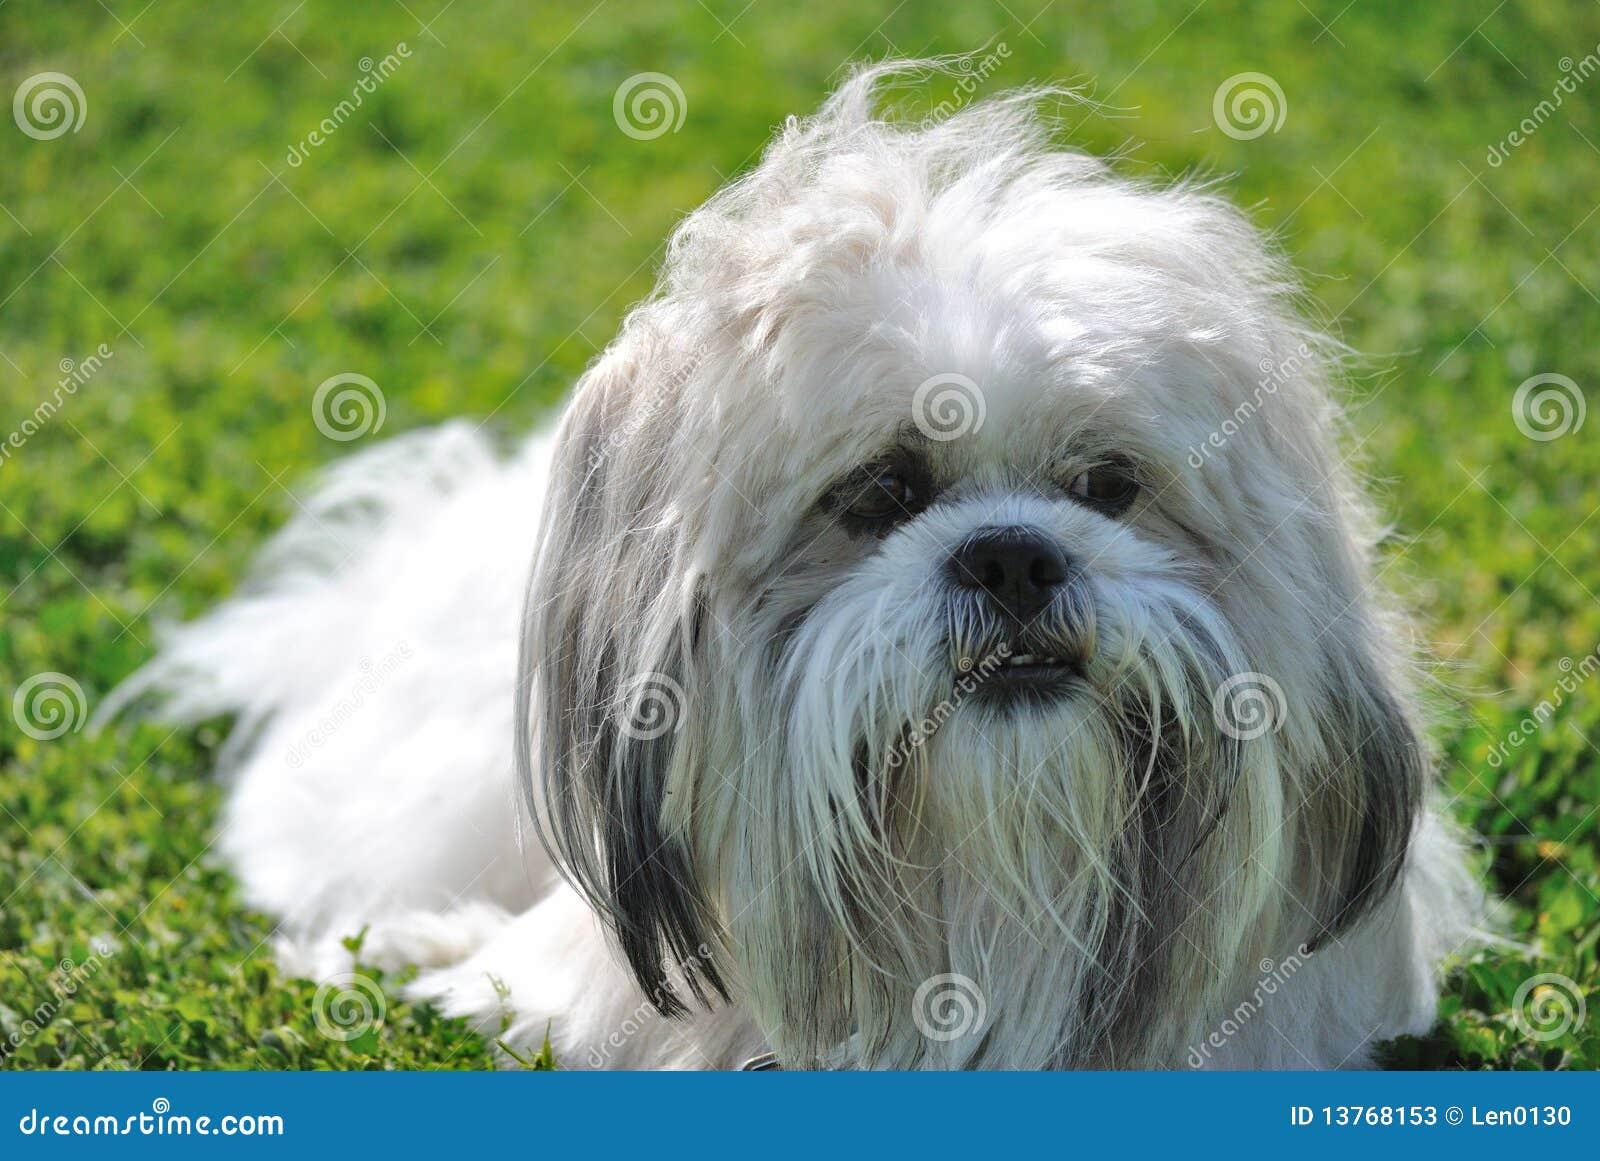 Tzu de Shih se reposant sur l herbe